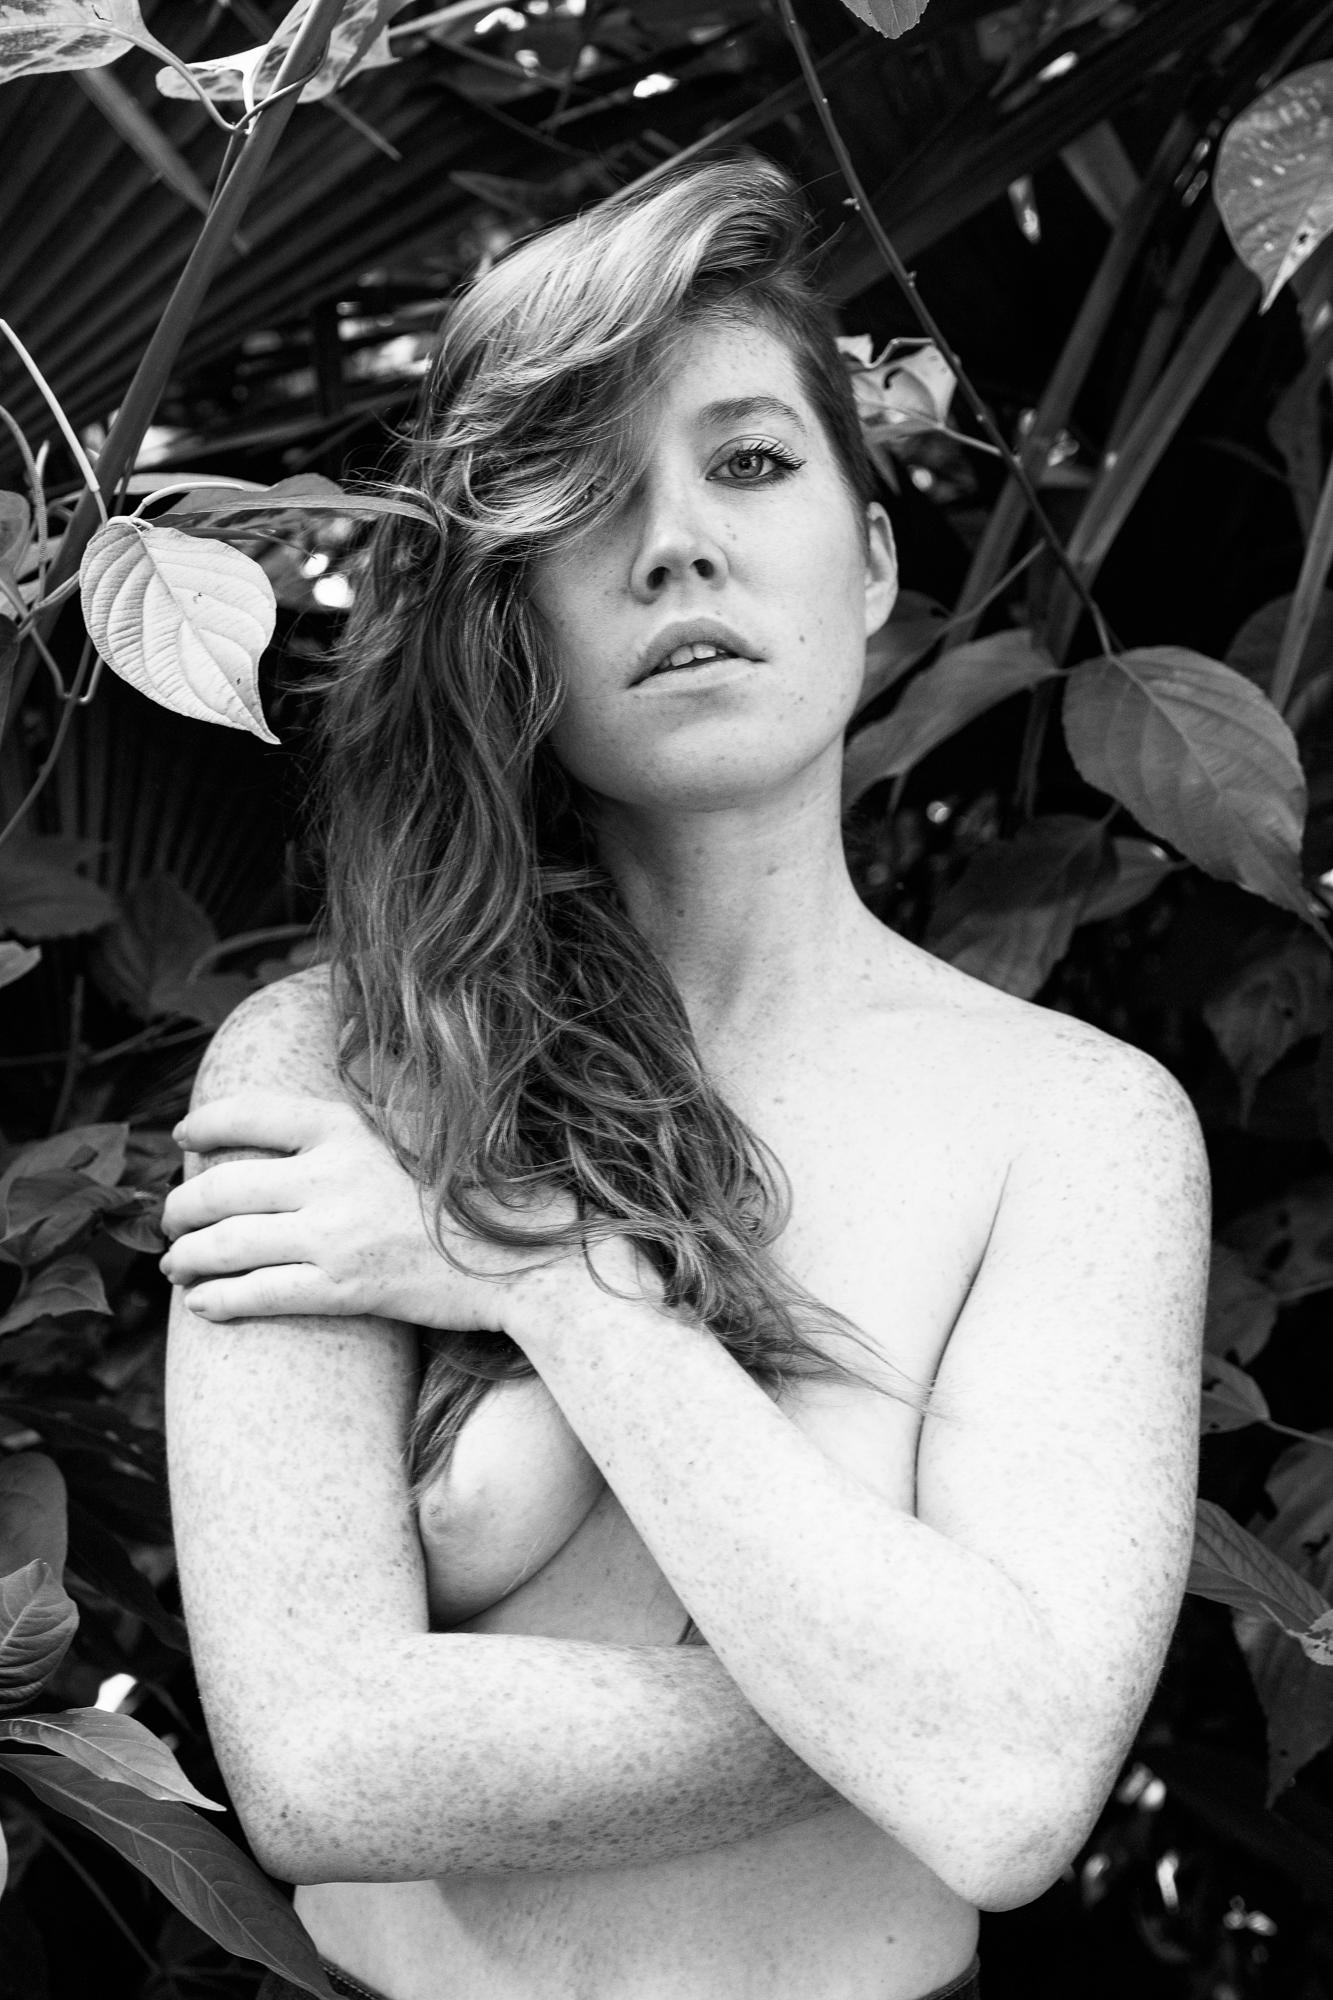 20170210-Ariane-Cassidy-Hannah-Amazon-jungle-FUJIFILM-X-Pro2-0077-Edit.jpg